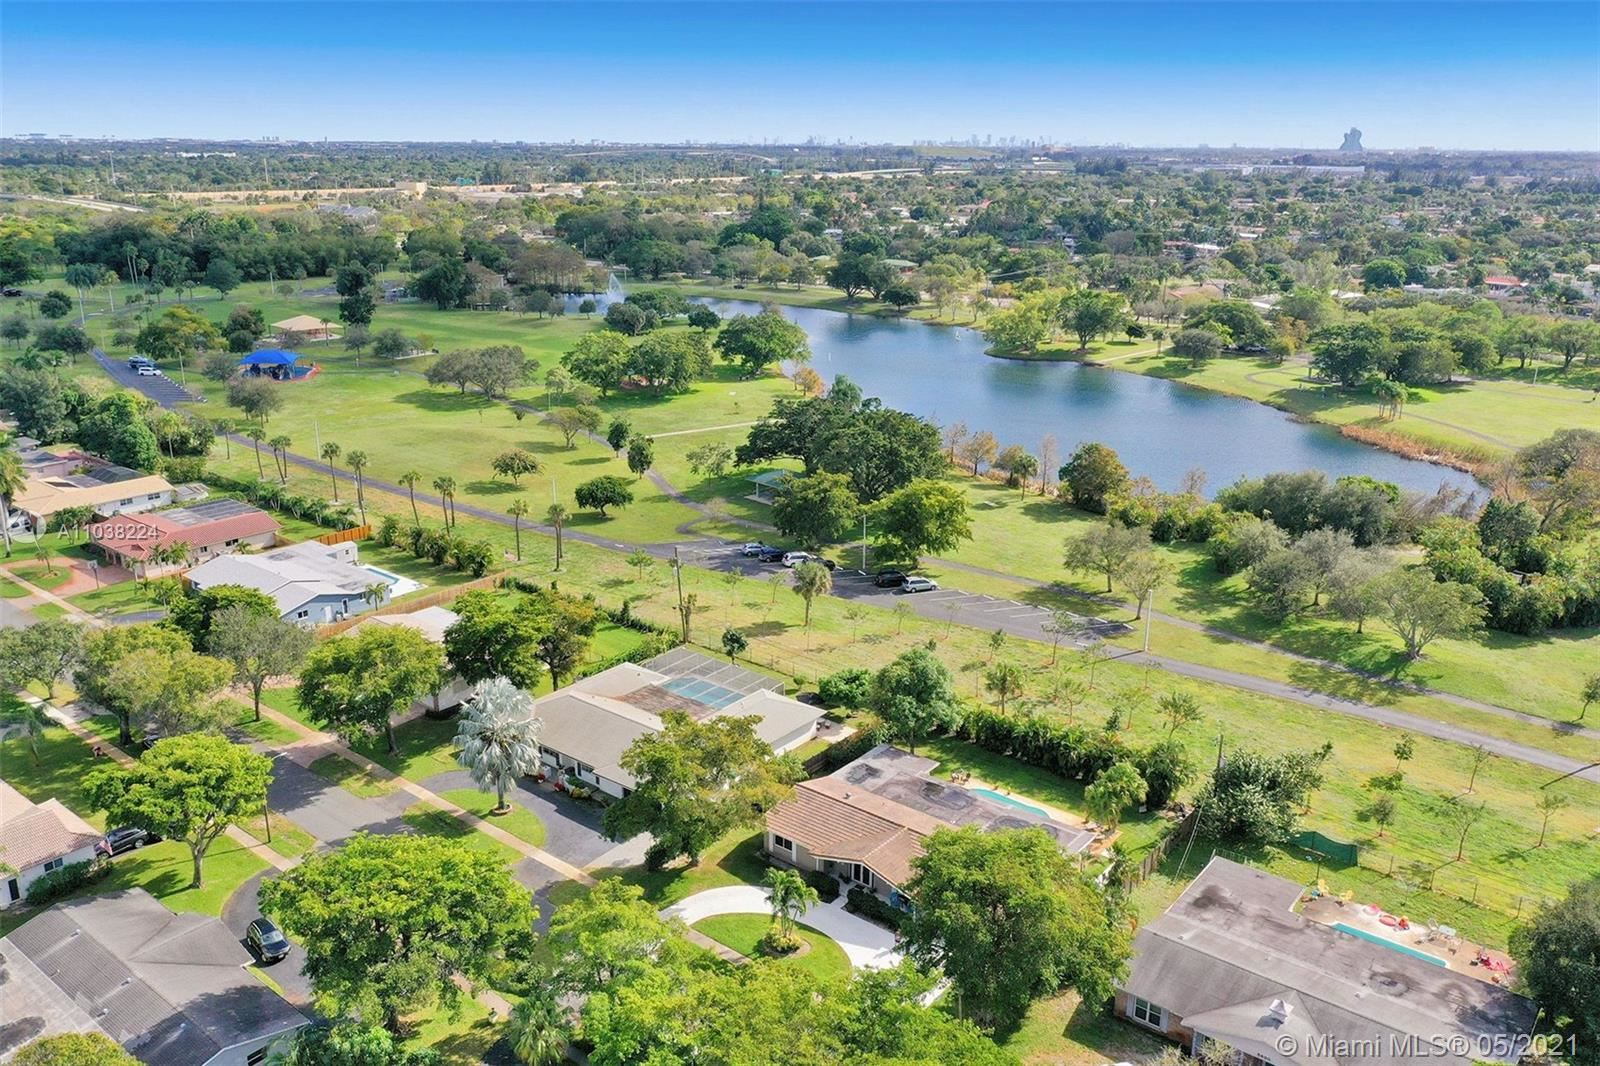 Photo of 5760 SW 9th St, Plantation, FL 33317 (MLS # A11038224)